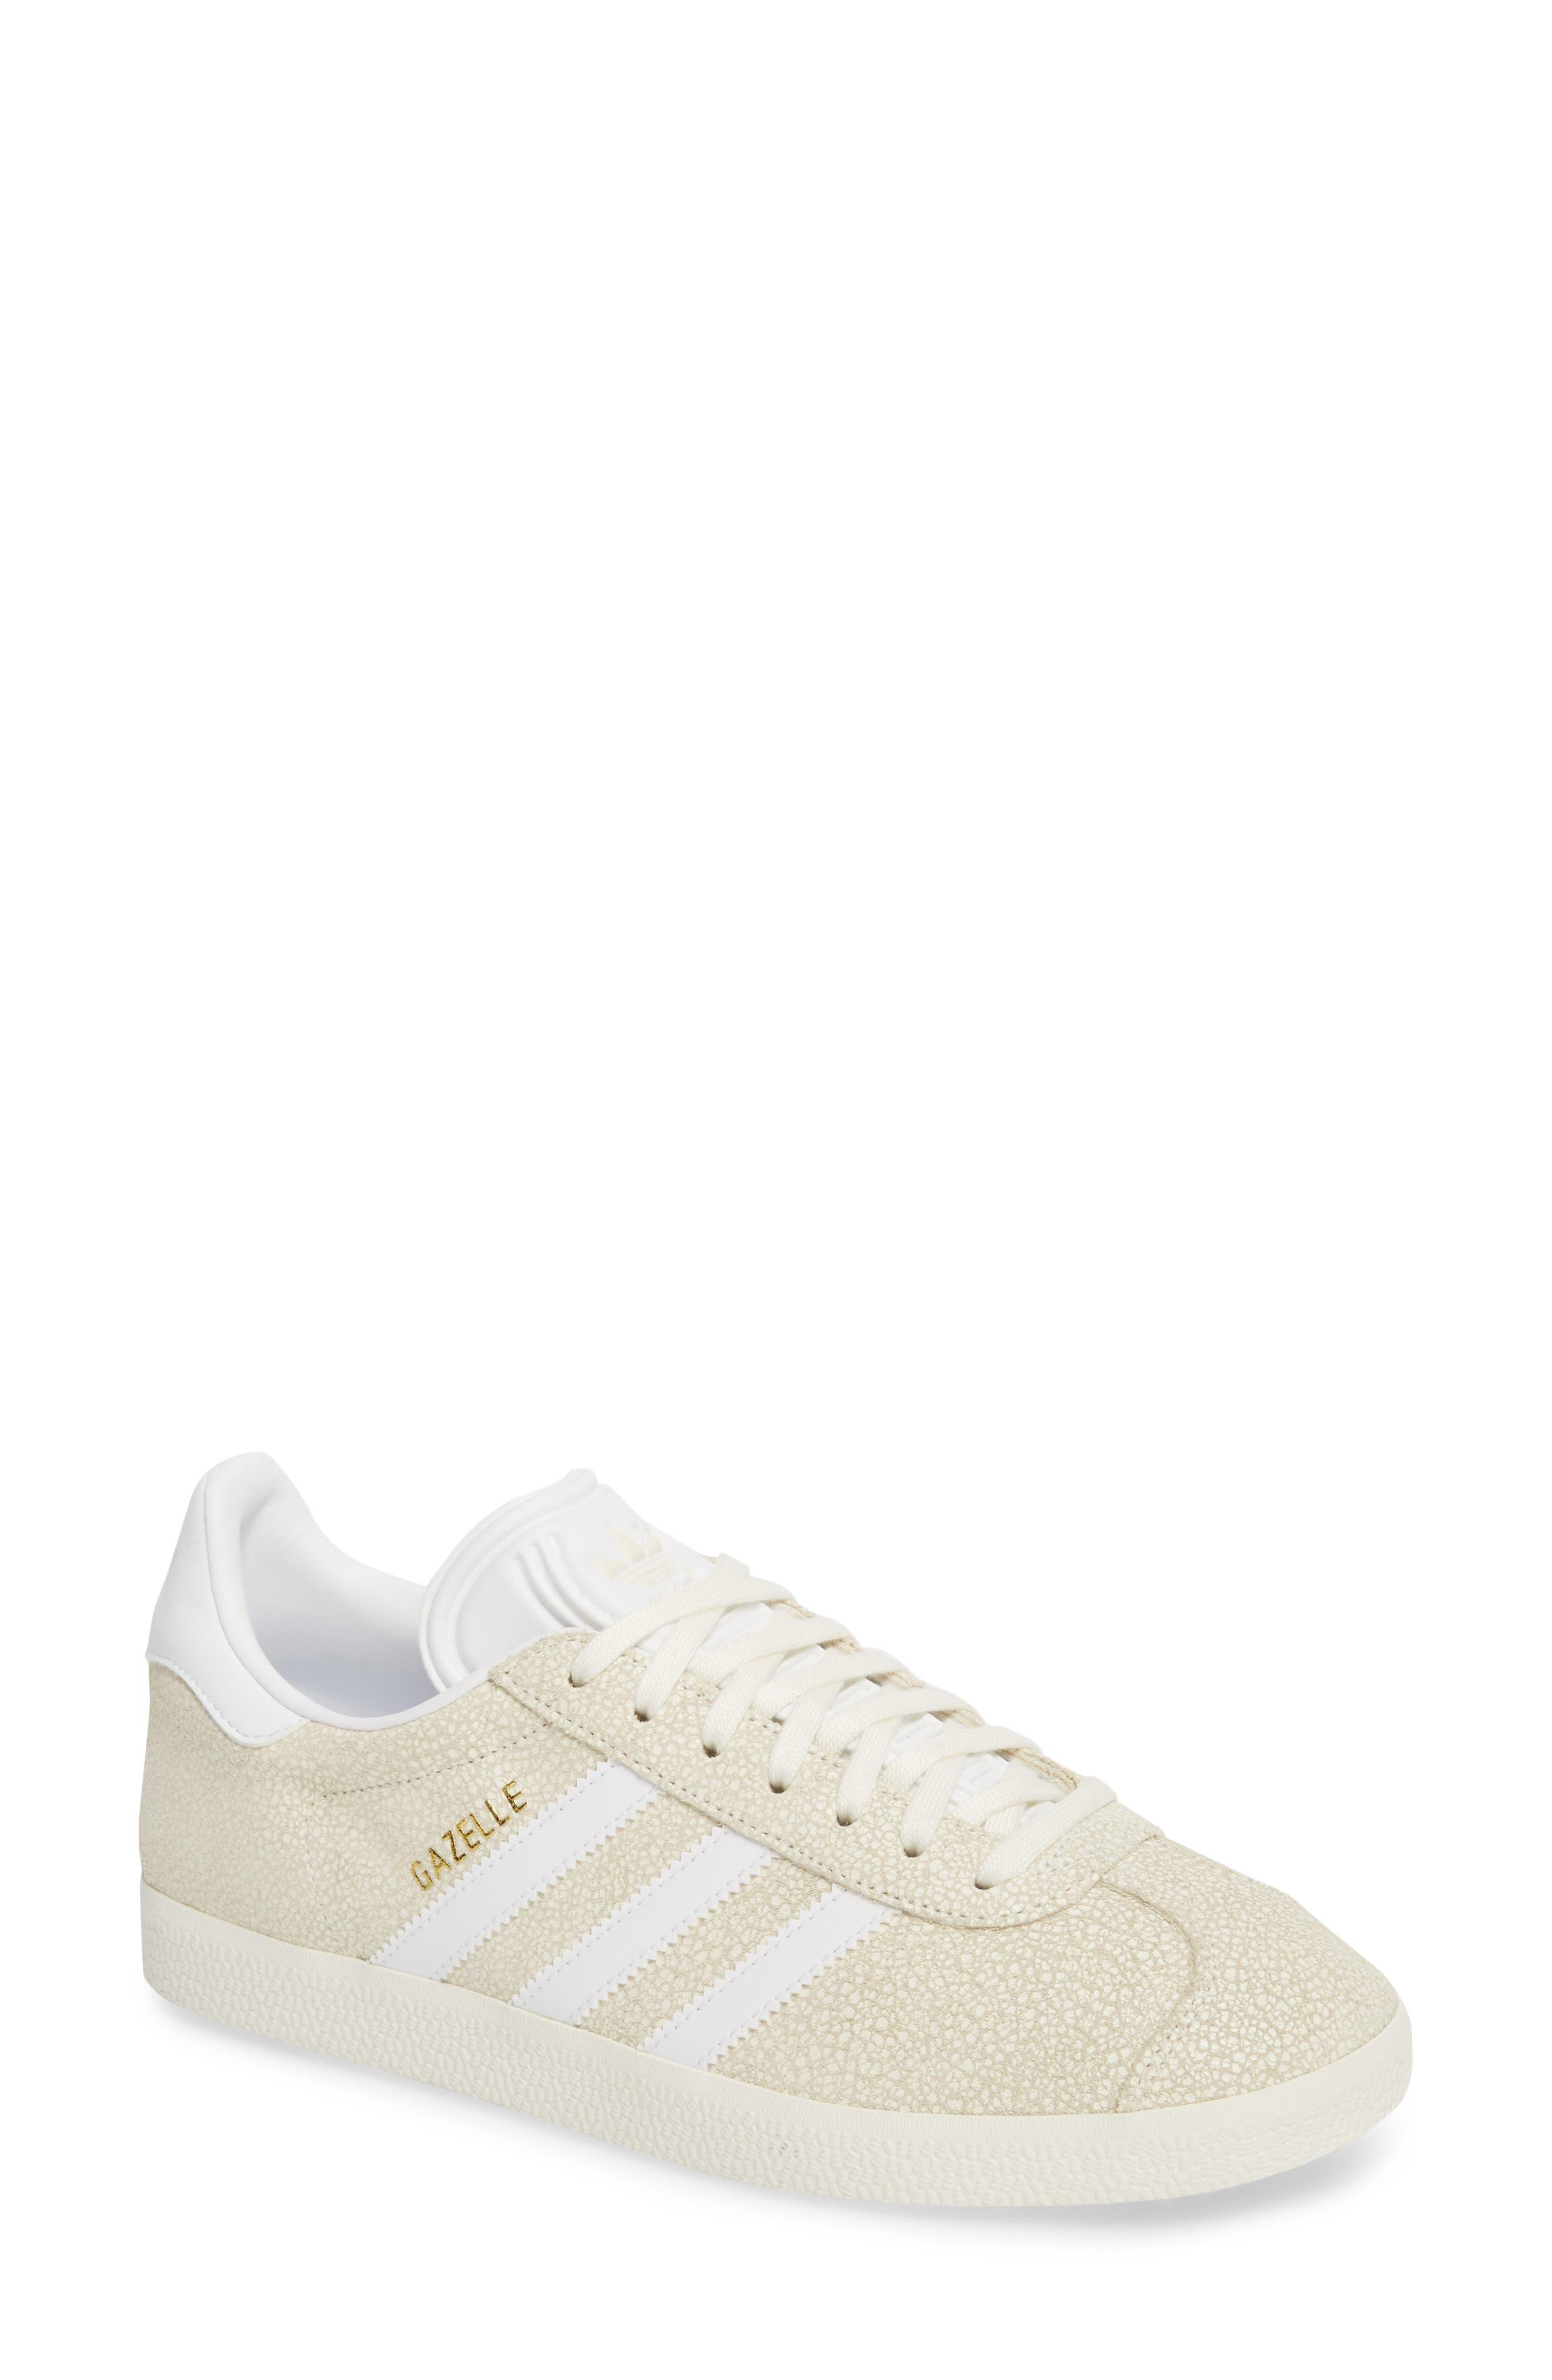 Gazelle Sneaker,                         Main,                         color, OFF WHITE/ WHITE/ OFF WHITE